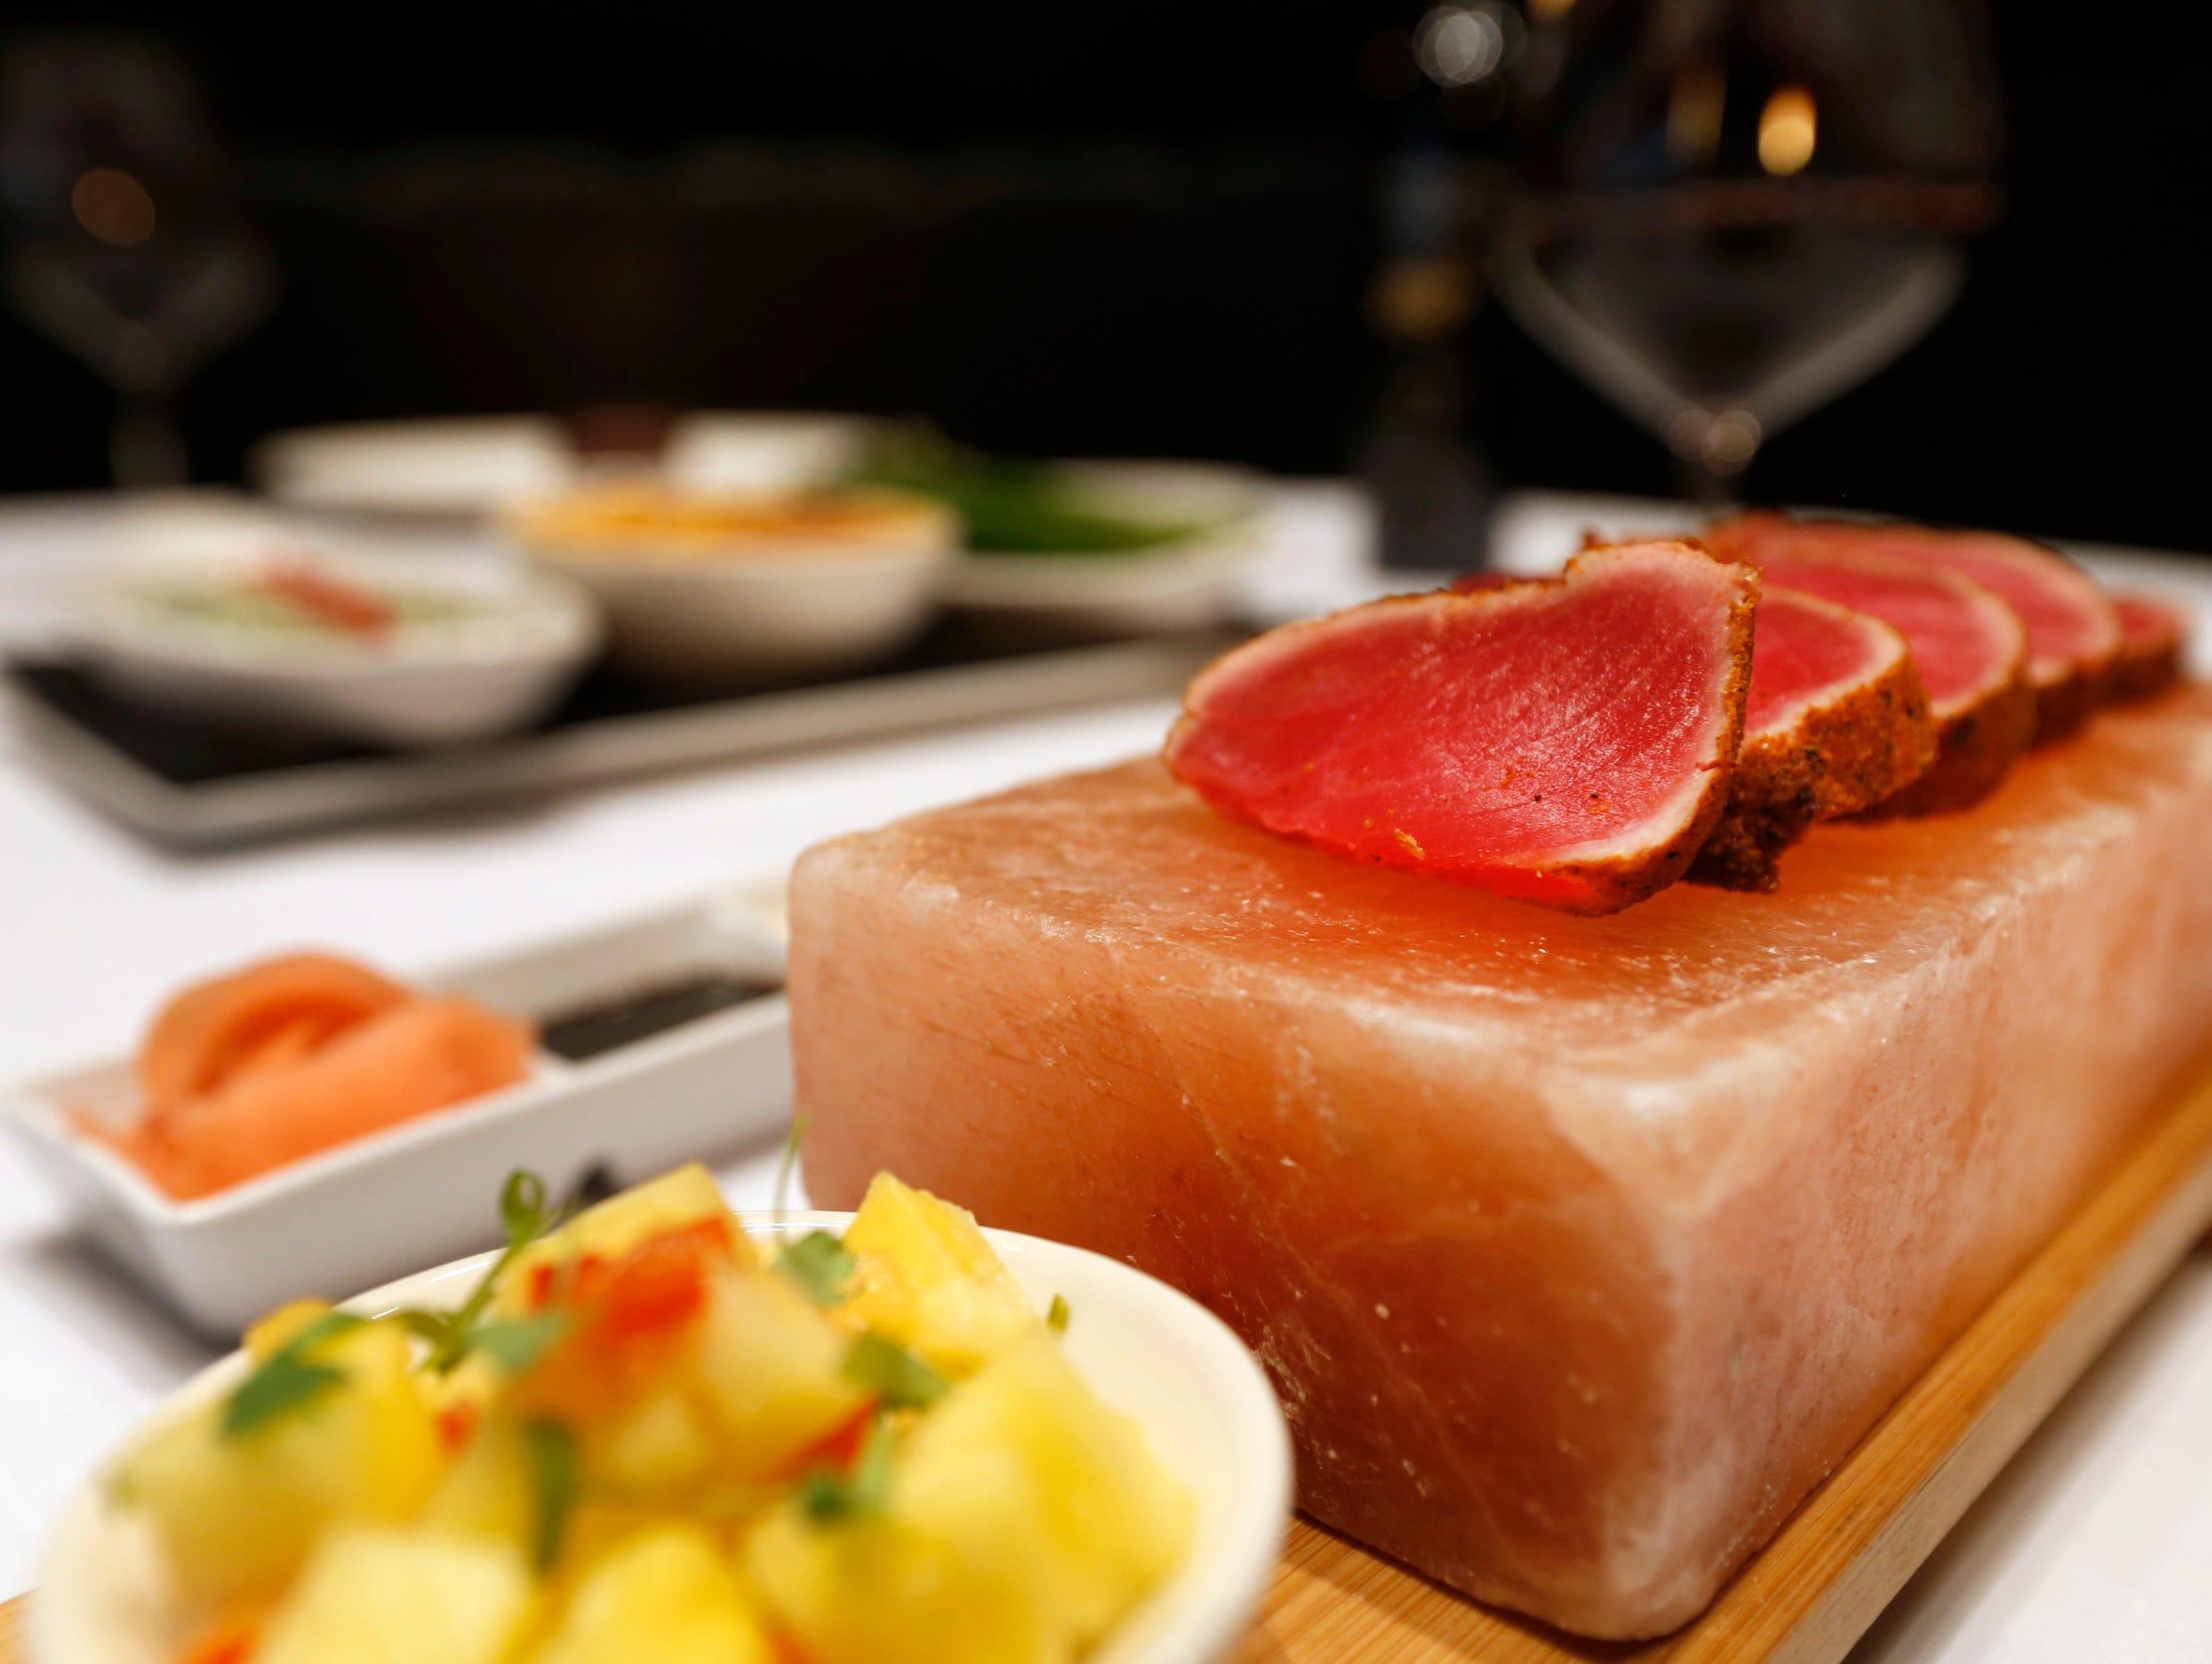 The Pan Seared Hawaiian Ahi Tuna at Level 2 Steakhouse